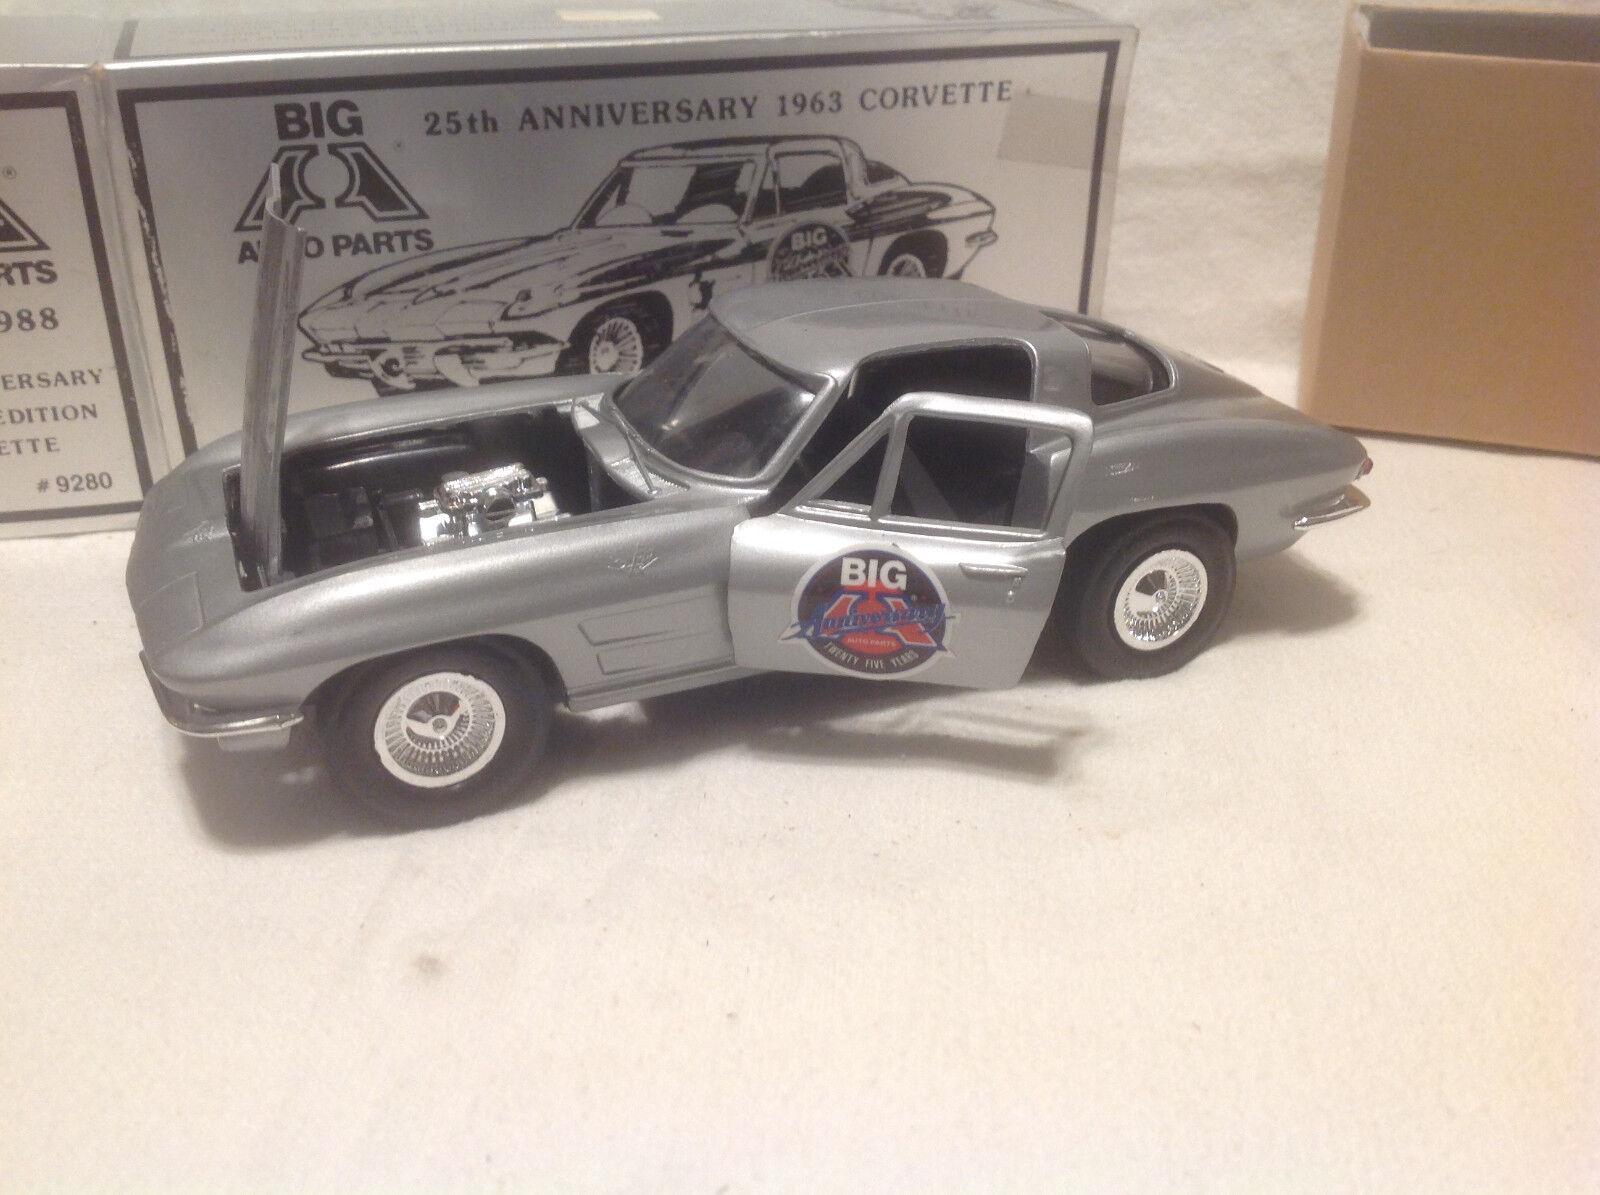 punto de venta barato Primero Primero Primero uno Corvette 1963 Stingris 25 Aniversario Grande Auto n.e.p.  9280  Sin impuestos